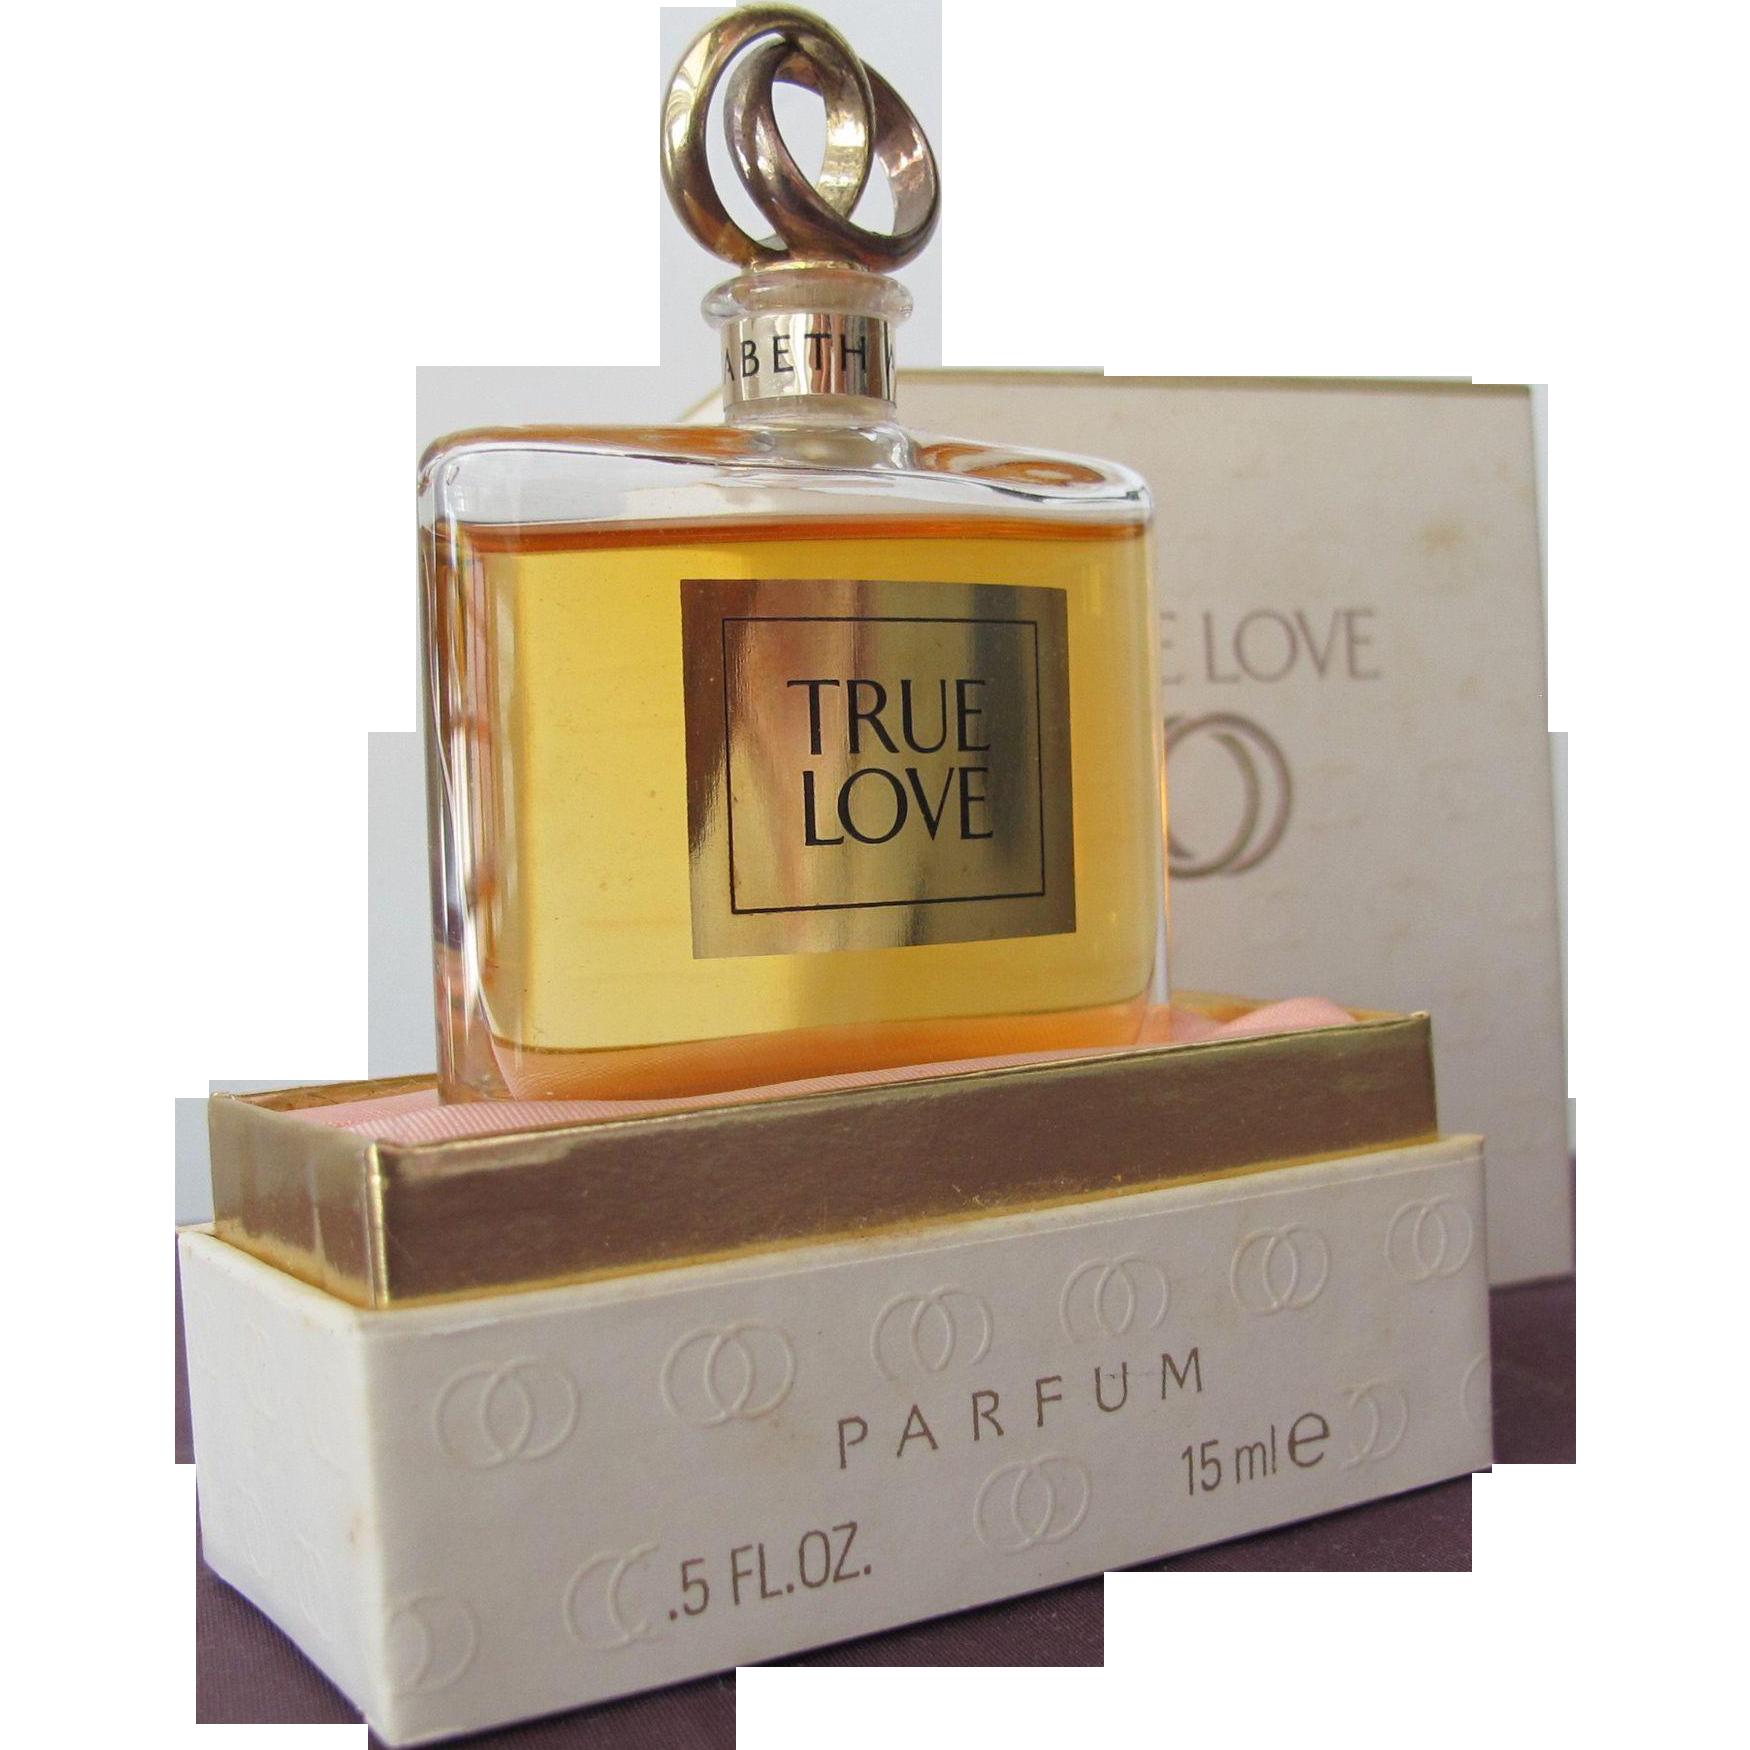 Elizabeth Arden Vintage Perfume Bottle True Love with Wedding Ring Top in Boxes